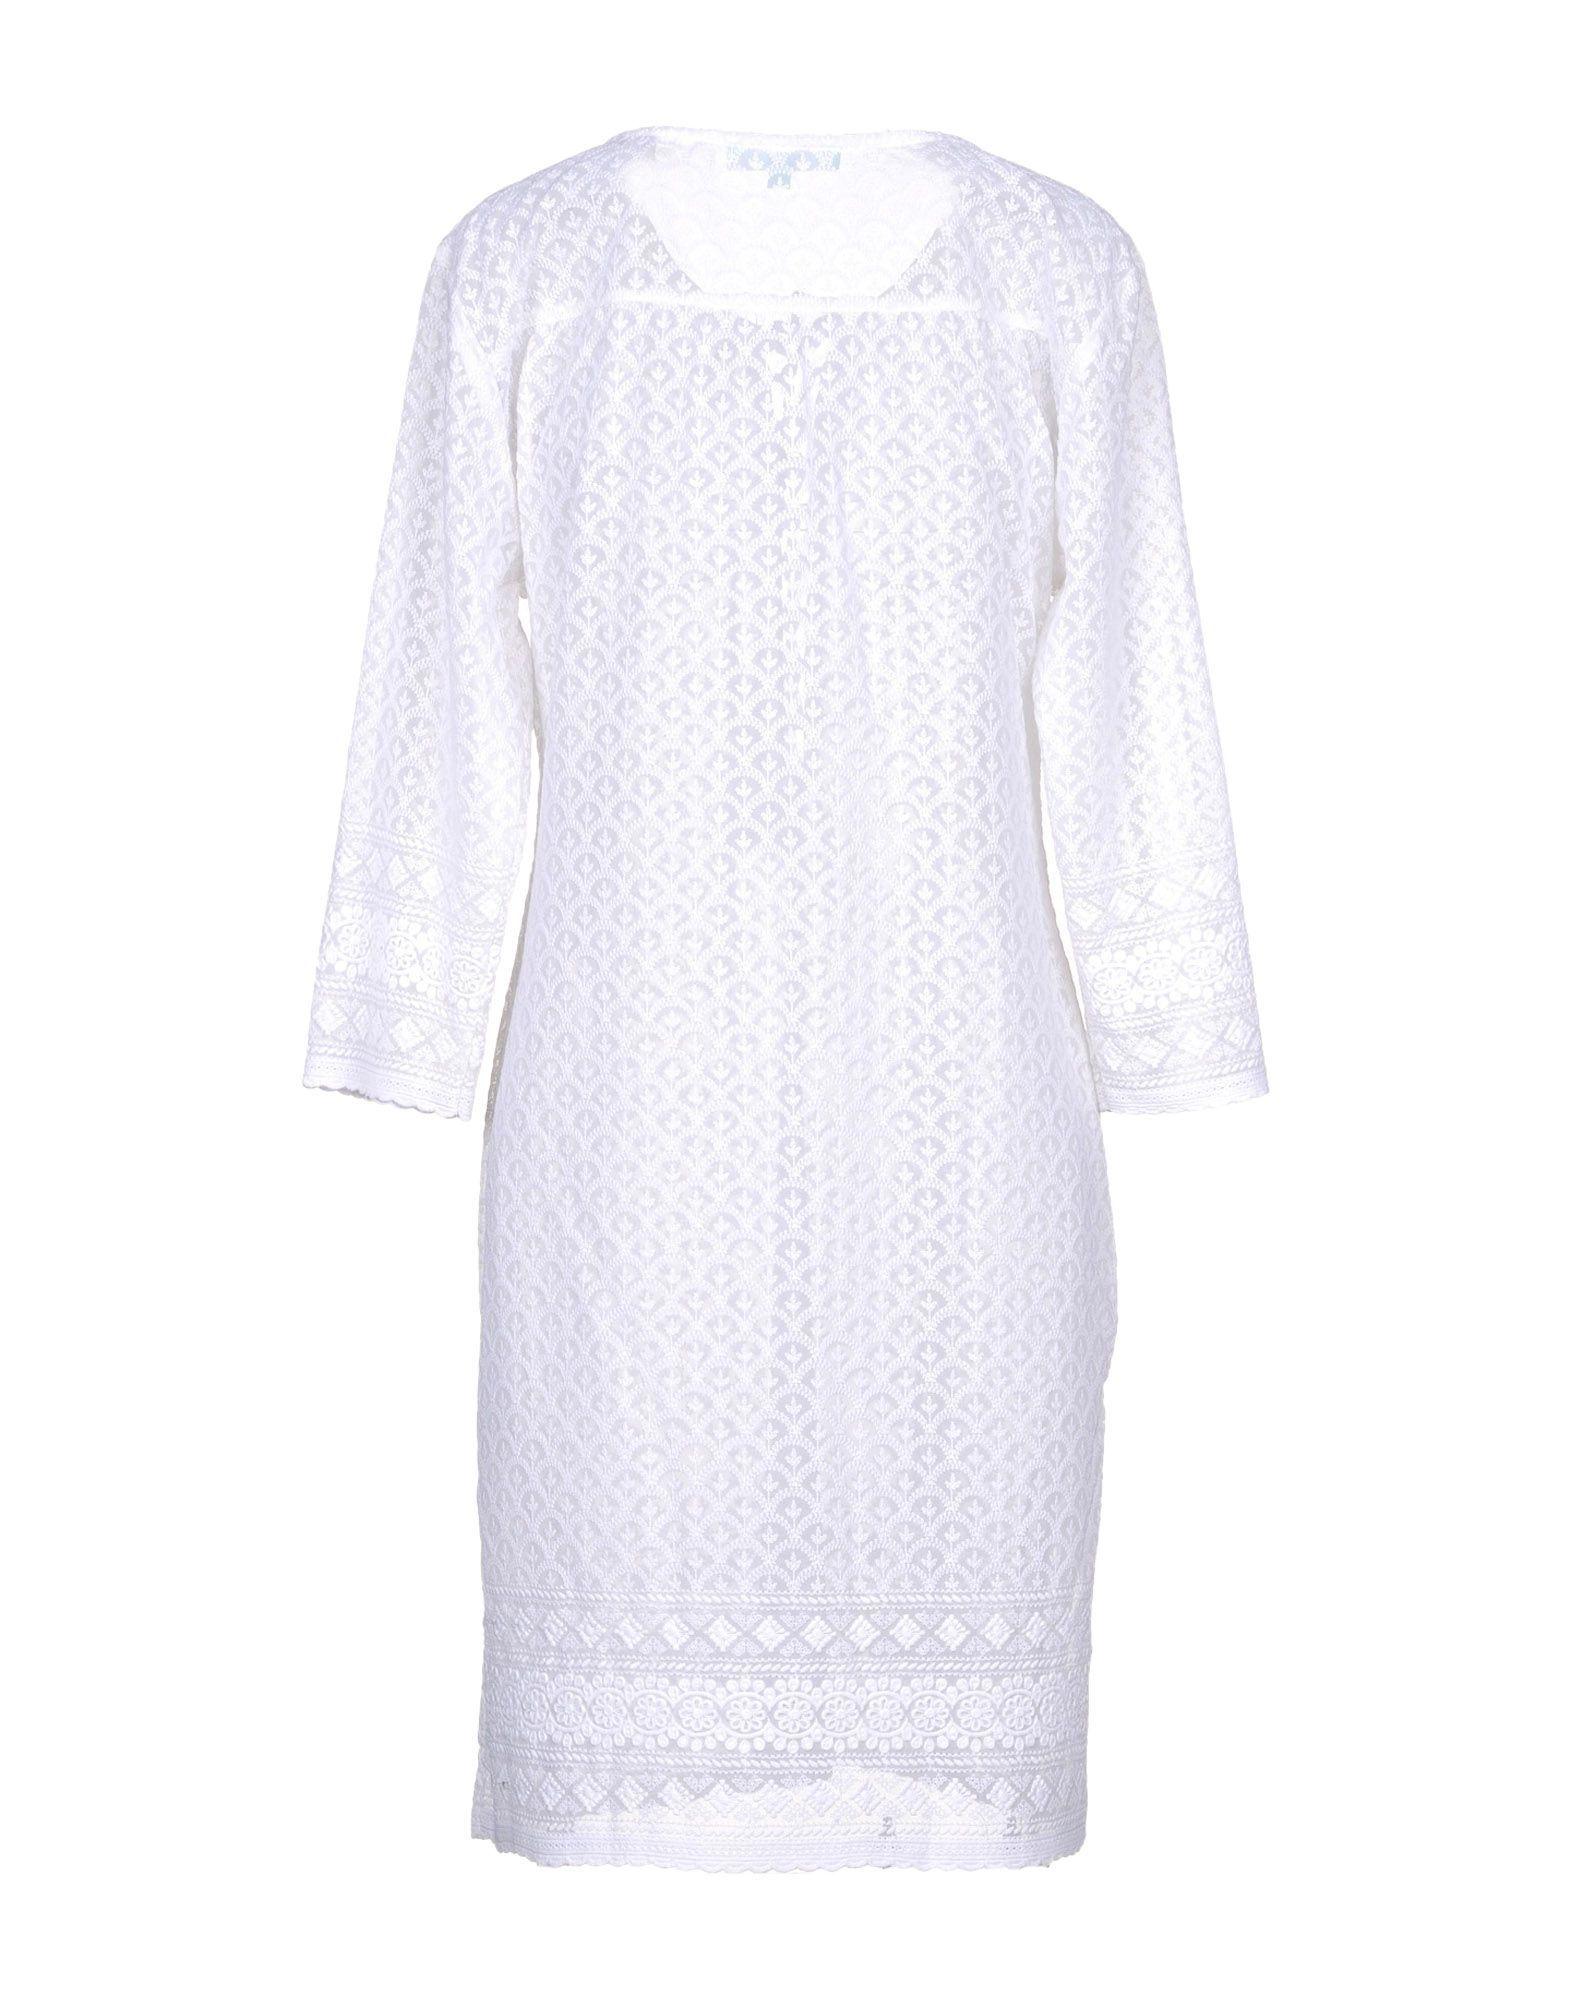 Melissa Odabash White Embroidered Detail Dress